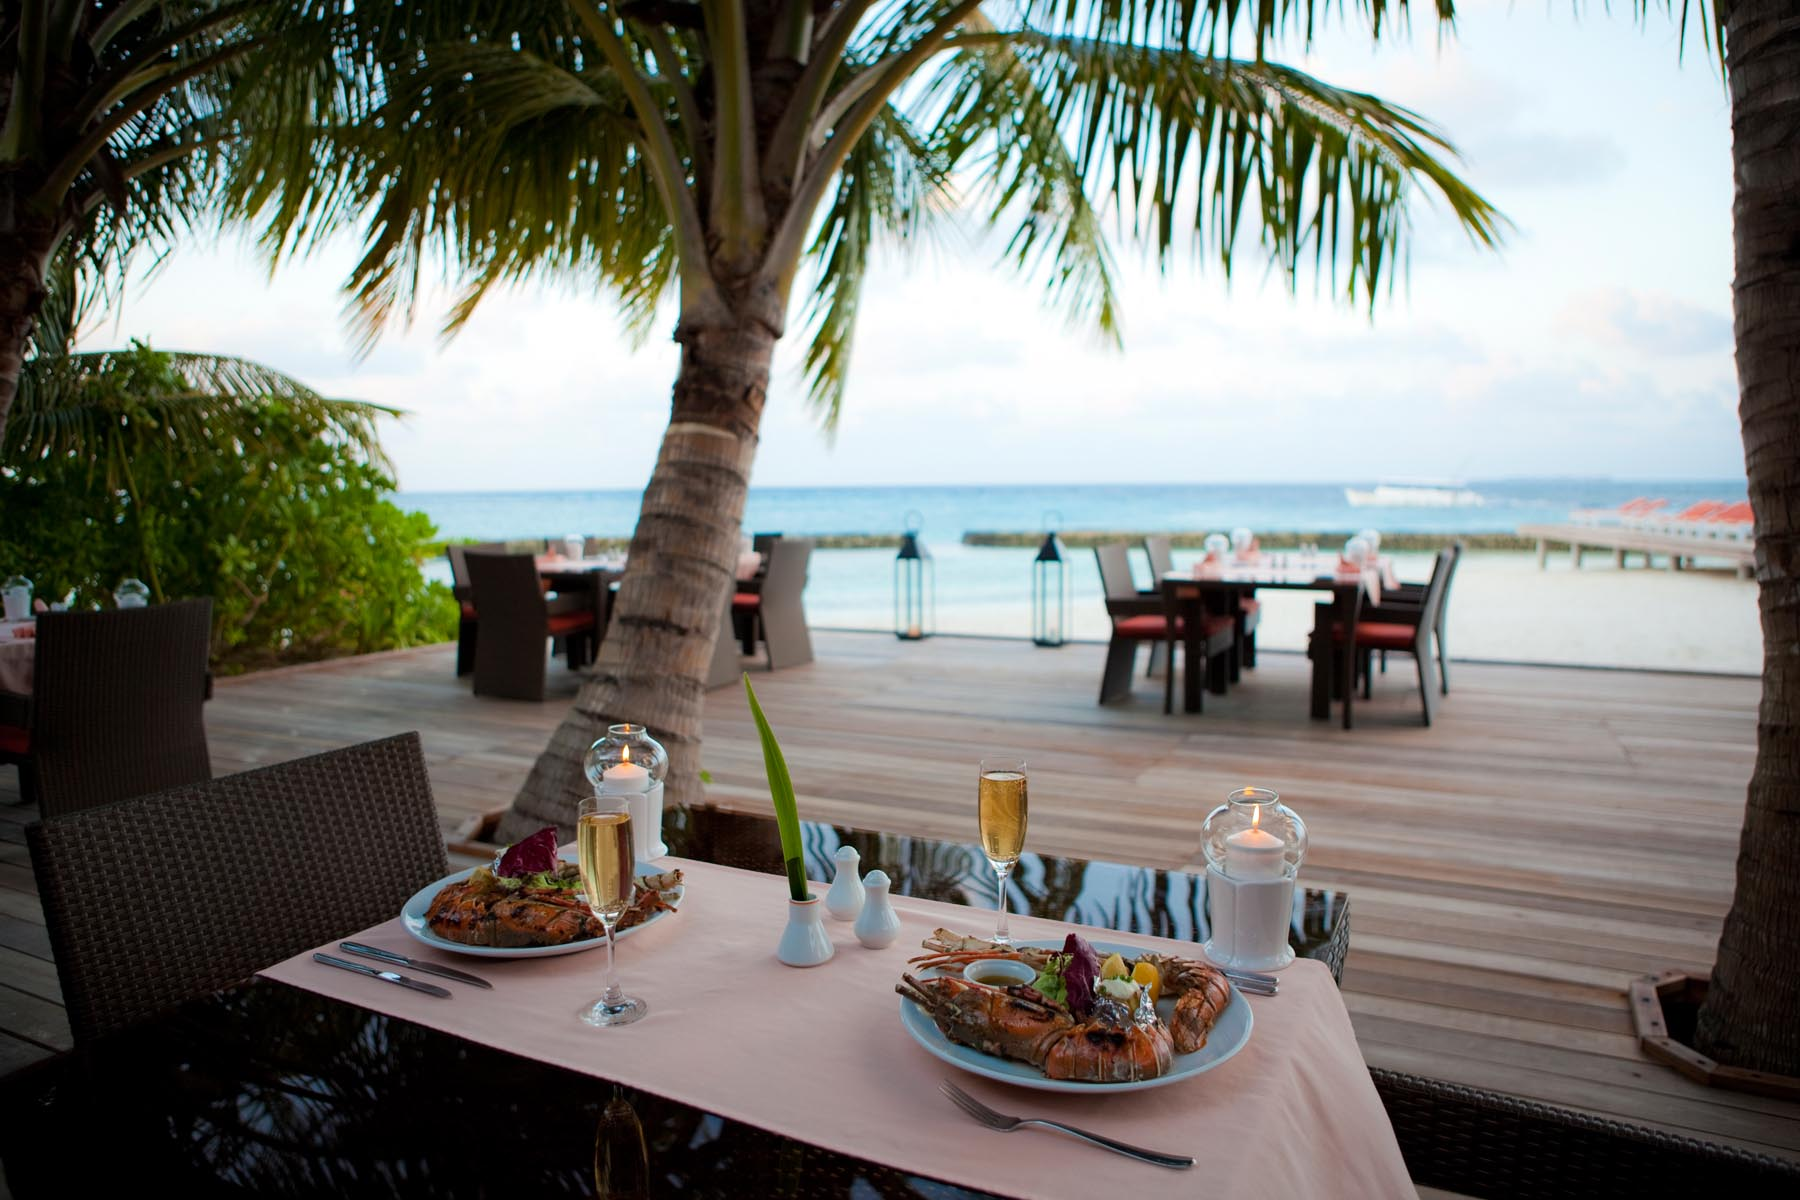 Island Barbeque - Sam and Michelle Takeaway wedding - the Honeymoon - Luxury Maldives Honeymoons